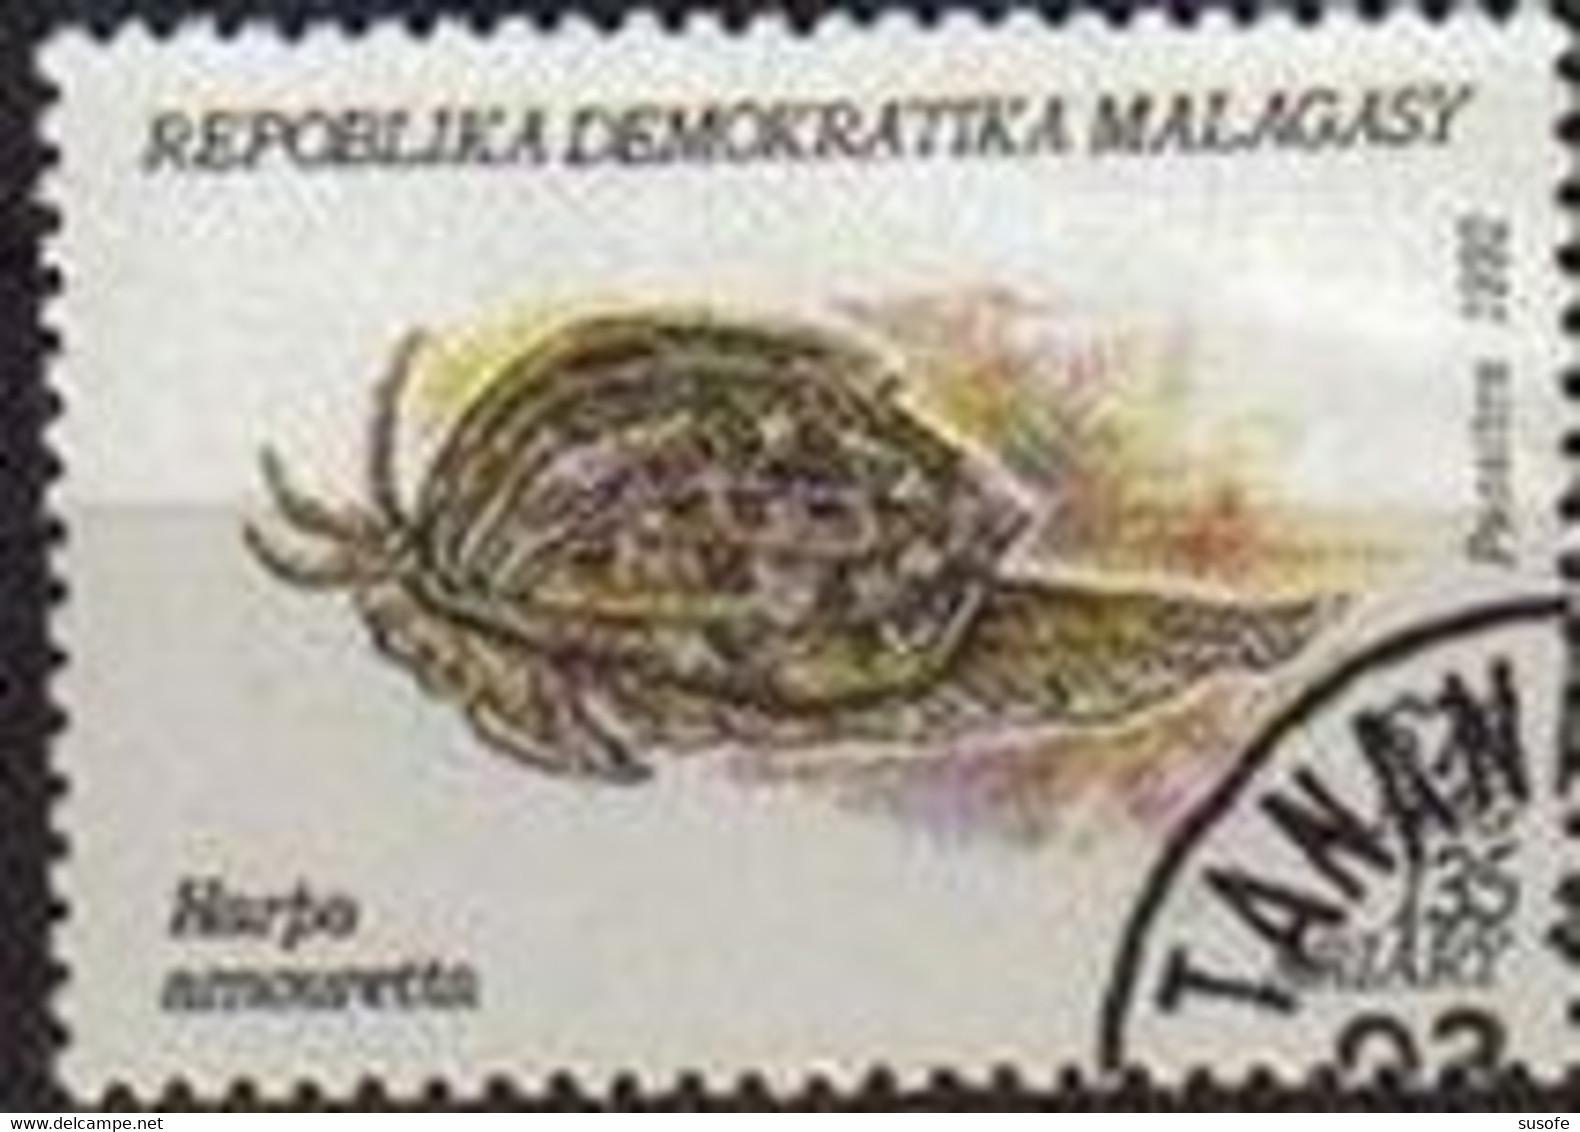 Madagascar 1992 Scott 1127 Sello * Moluscos Harpa Amouretta 135A Michel 1421 Malagasy Madagascar Stamps Timbre Briefmark - Madagascar (1960-...)